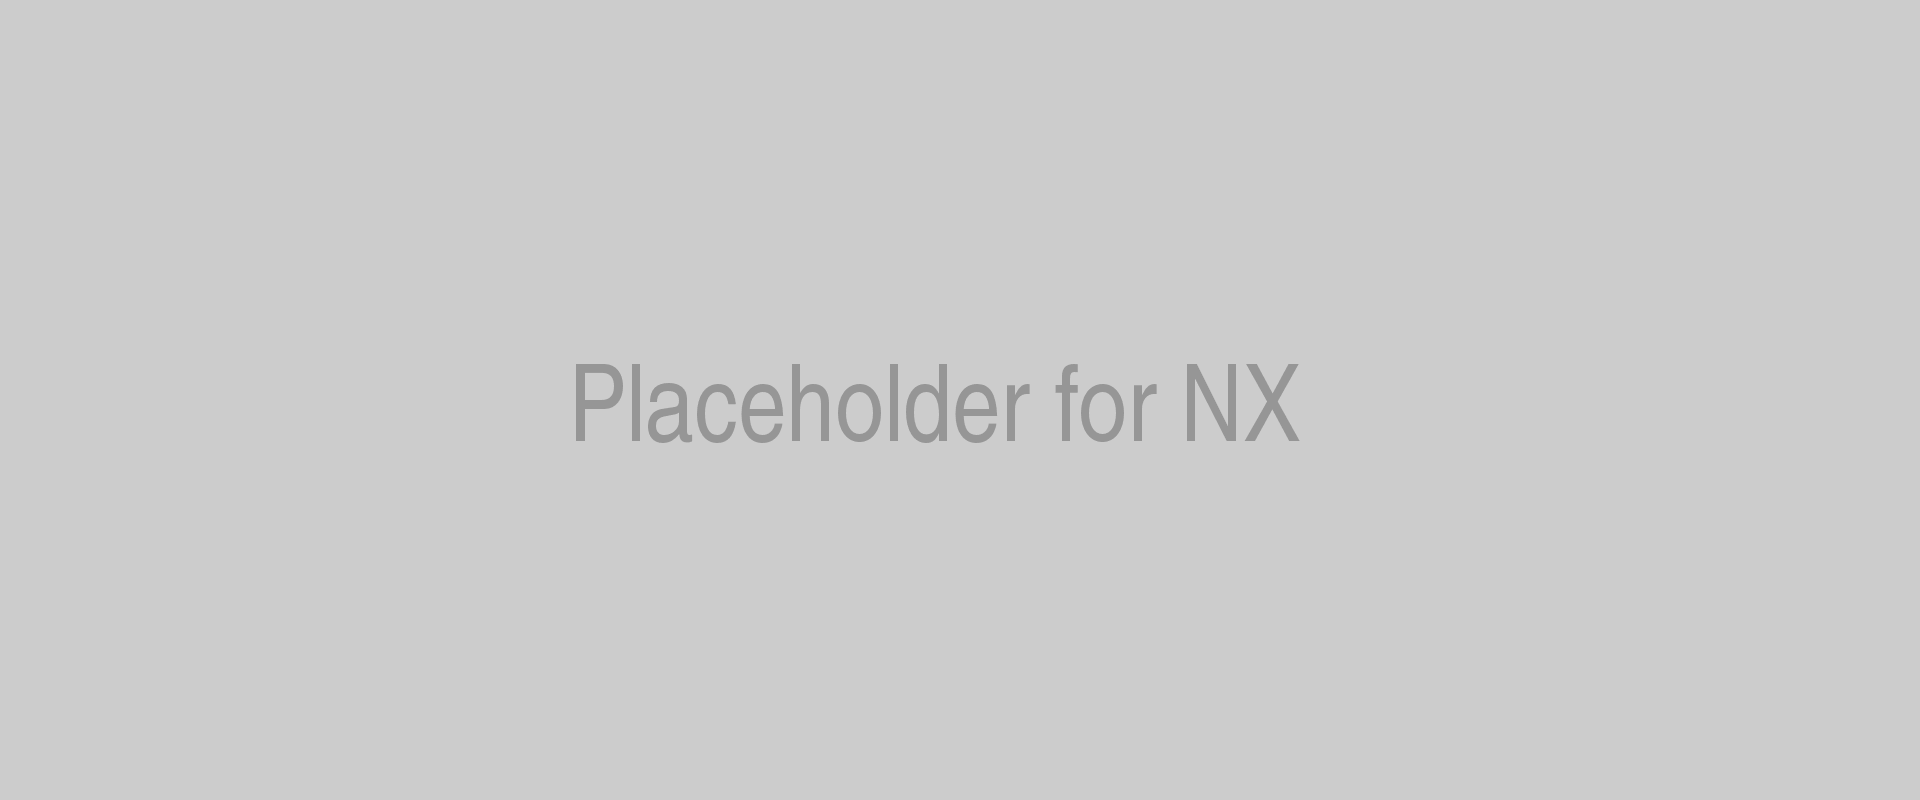 nx-image